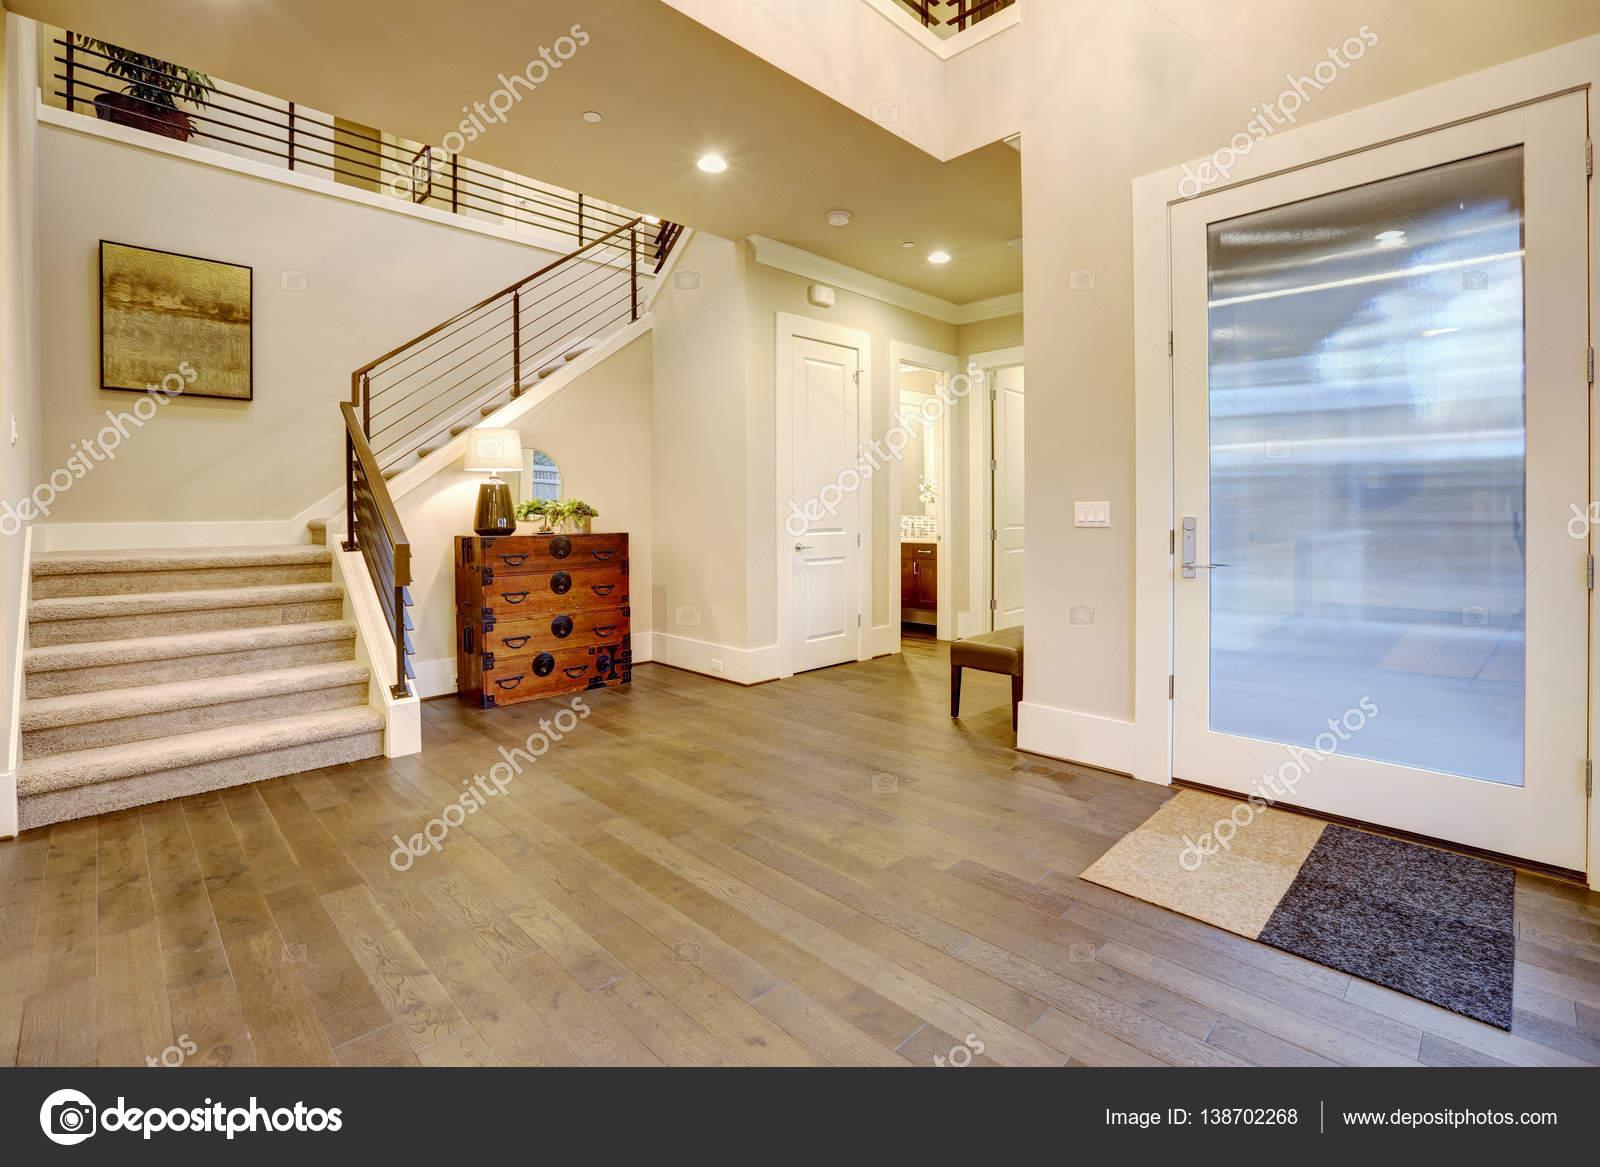 Foyer Design St Sauveur : Light modern foyer design boasts steamer trunk dresser